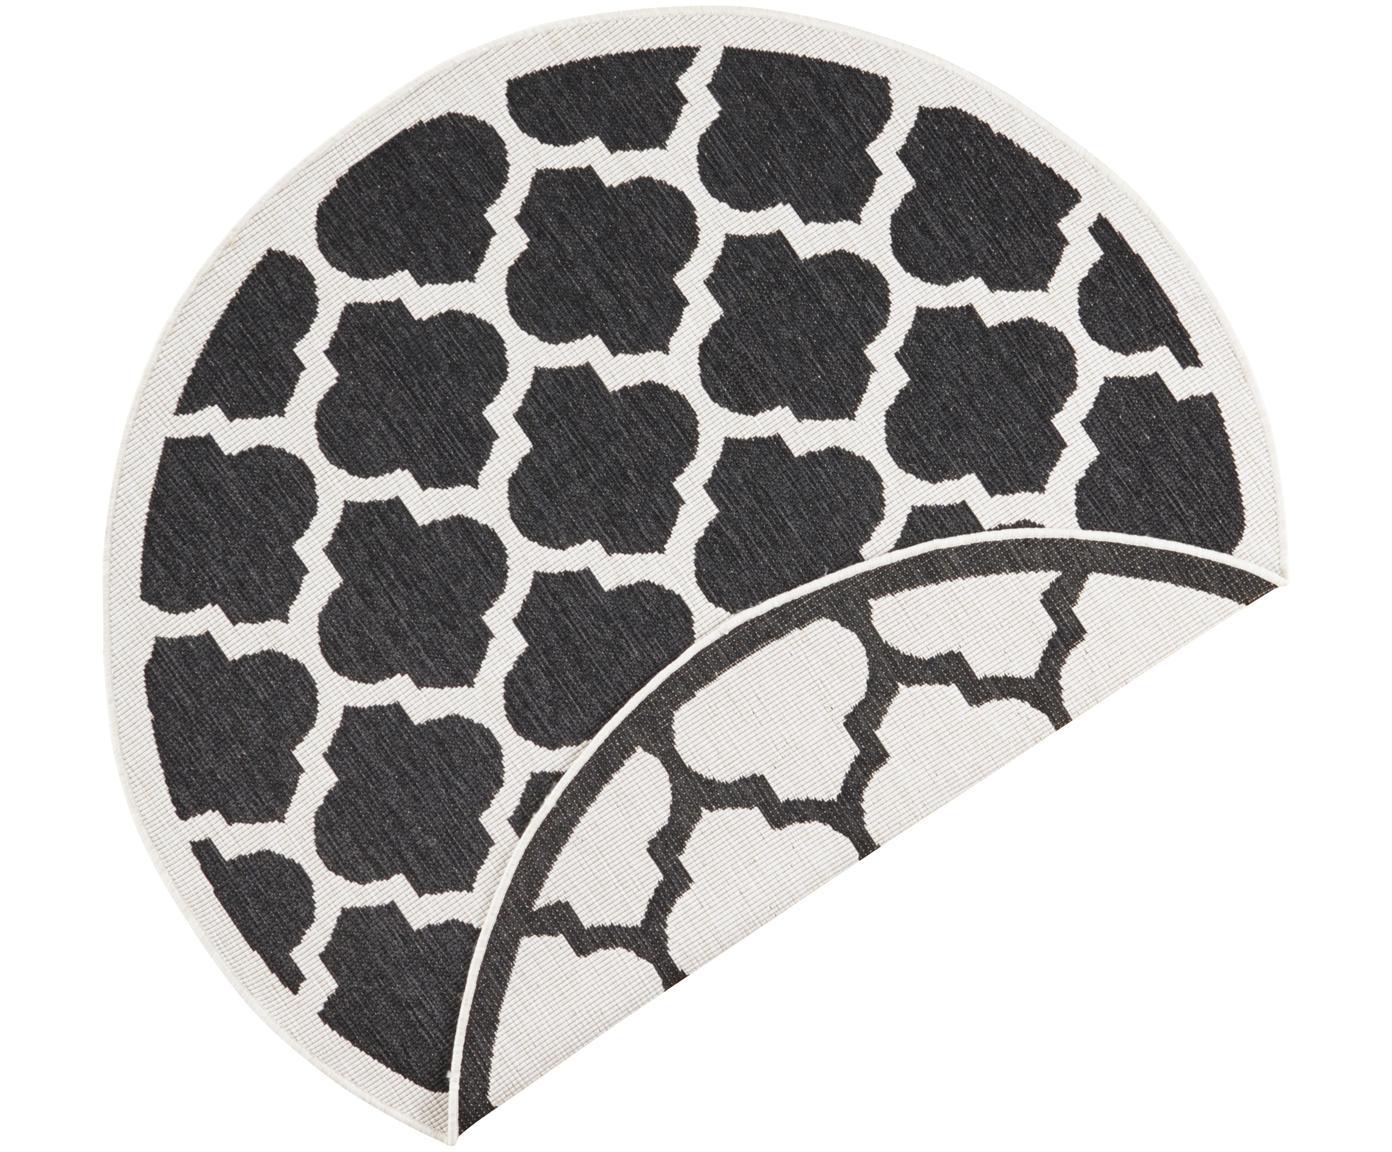 Alfombra redonda reversible de interior/exterior Palermo, Negro, crema, Ø 140 cm (Tamaño M)